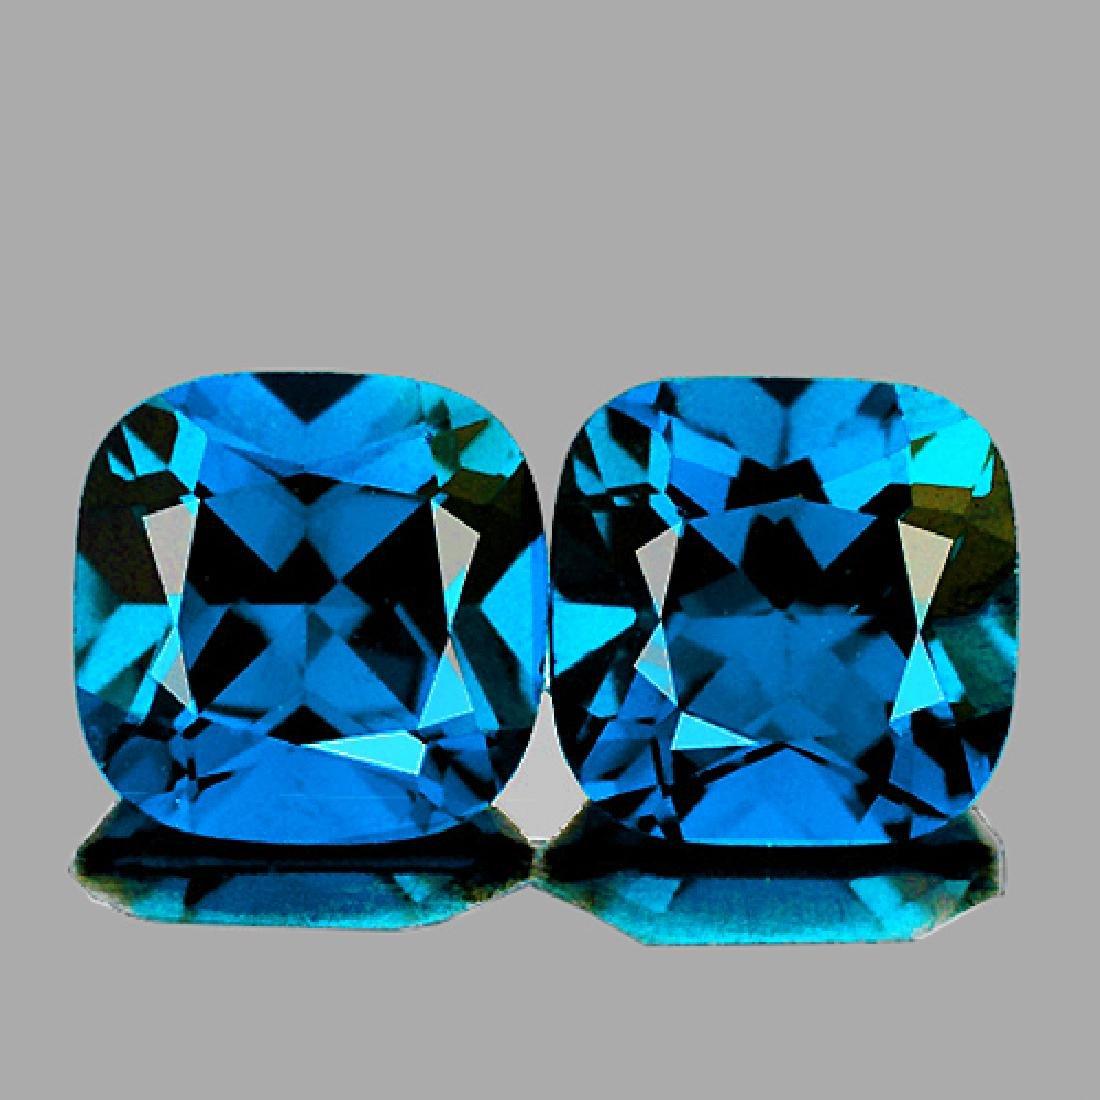 Natural Cushion London Blue Topaz 10.00 MM Pair - FL